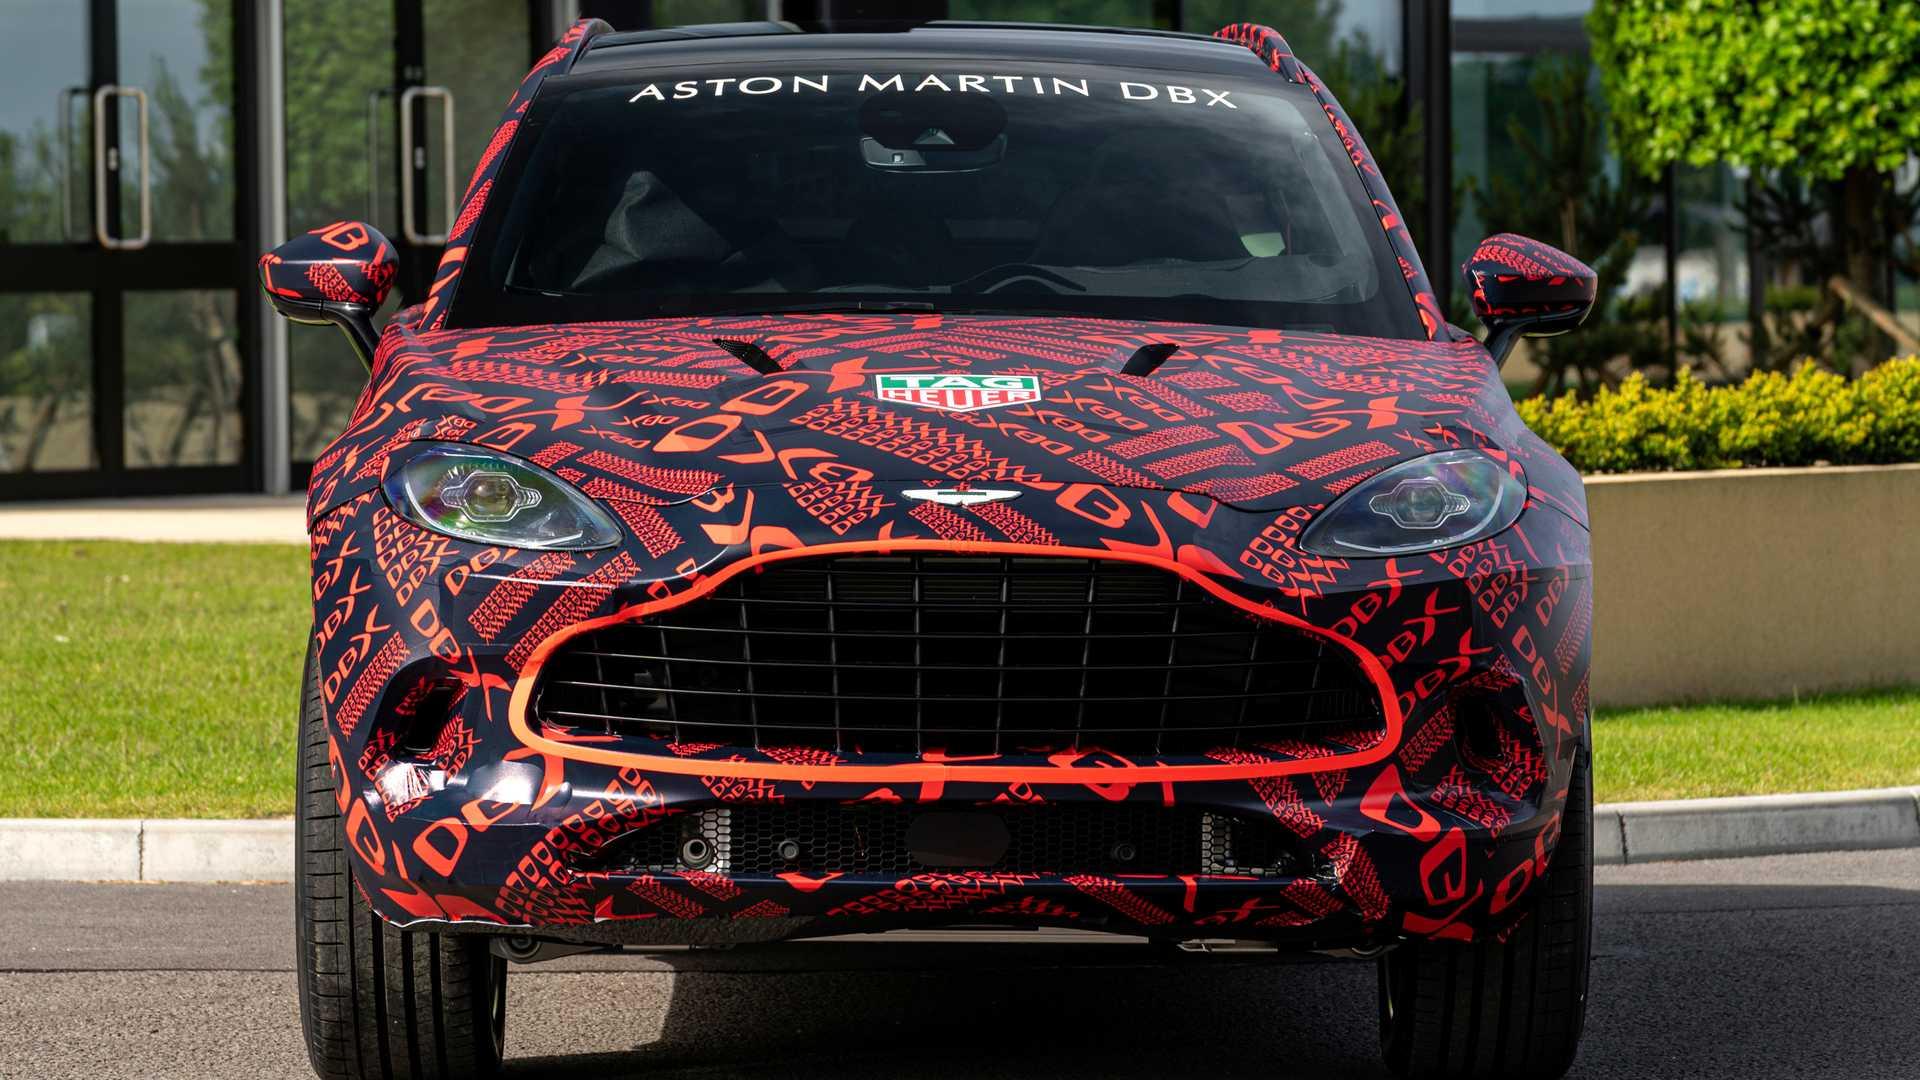 Aston Martin тестирует кроссовер на скорости 300 км/ч 1